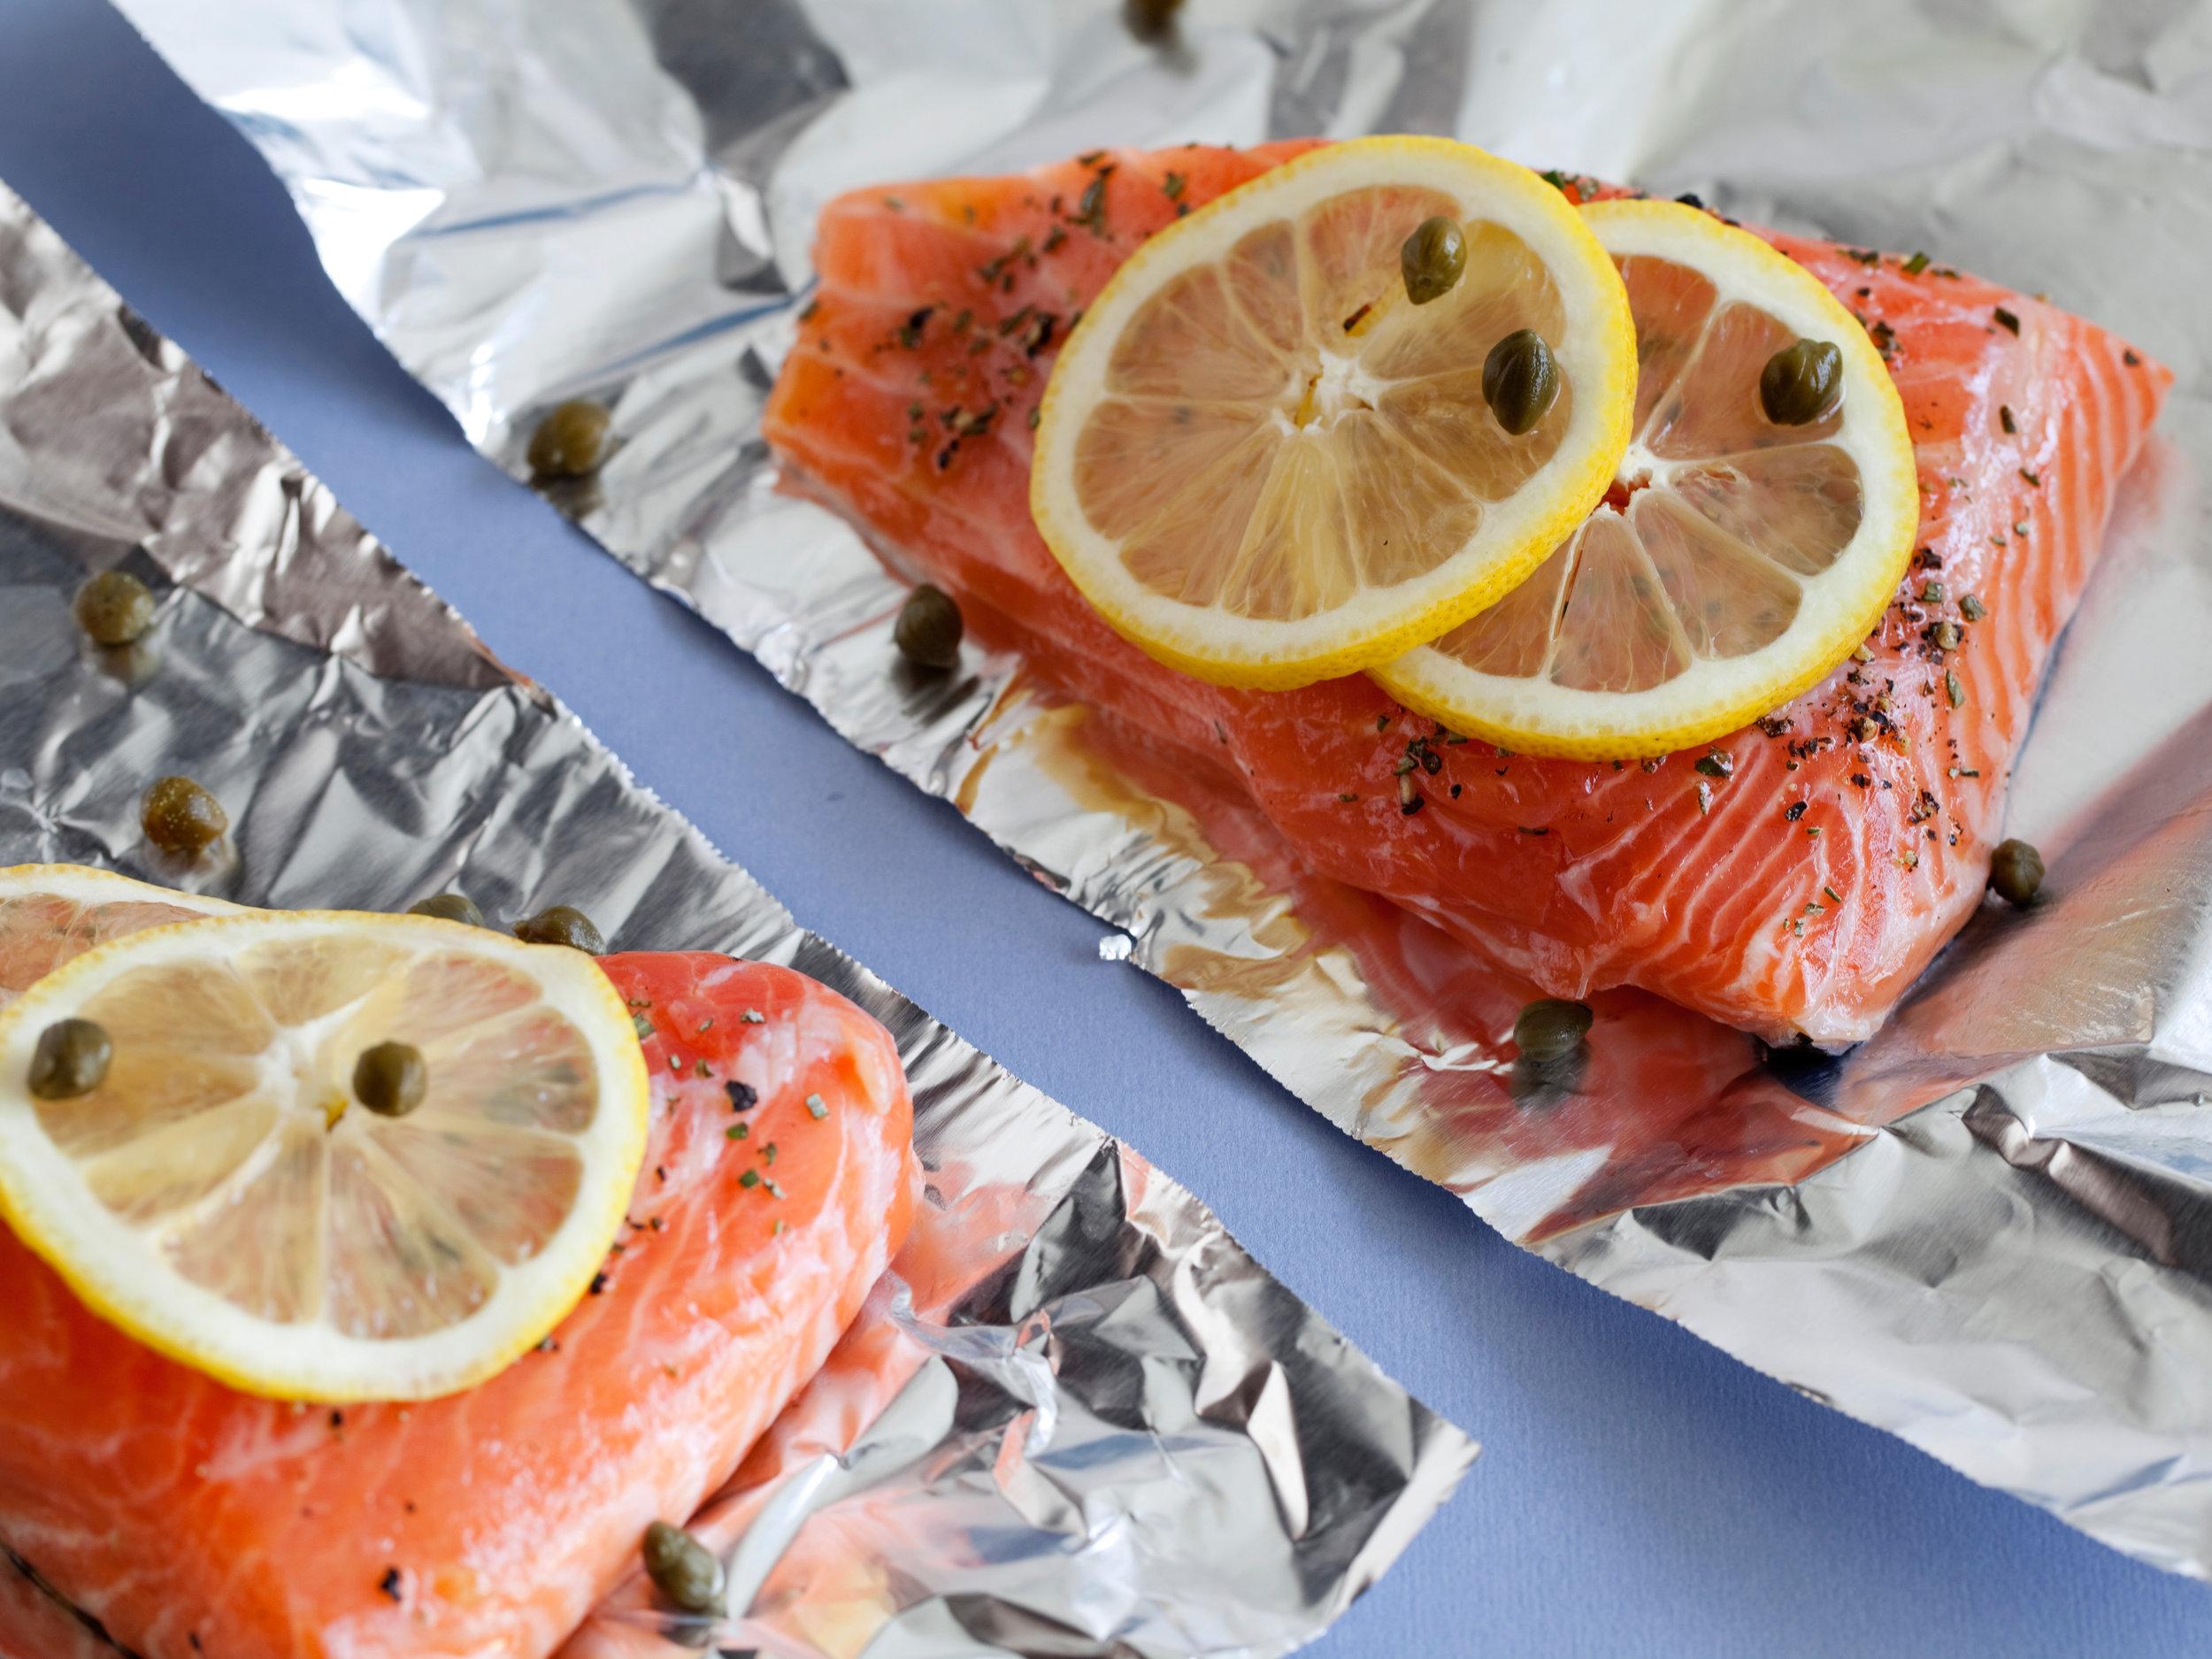 Giada's Salmon with Lemon, Capers & Rosemary